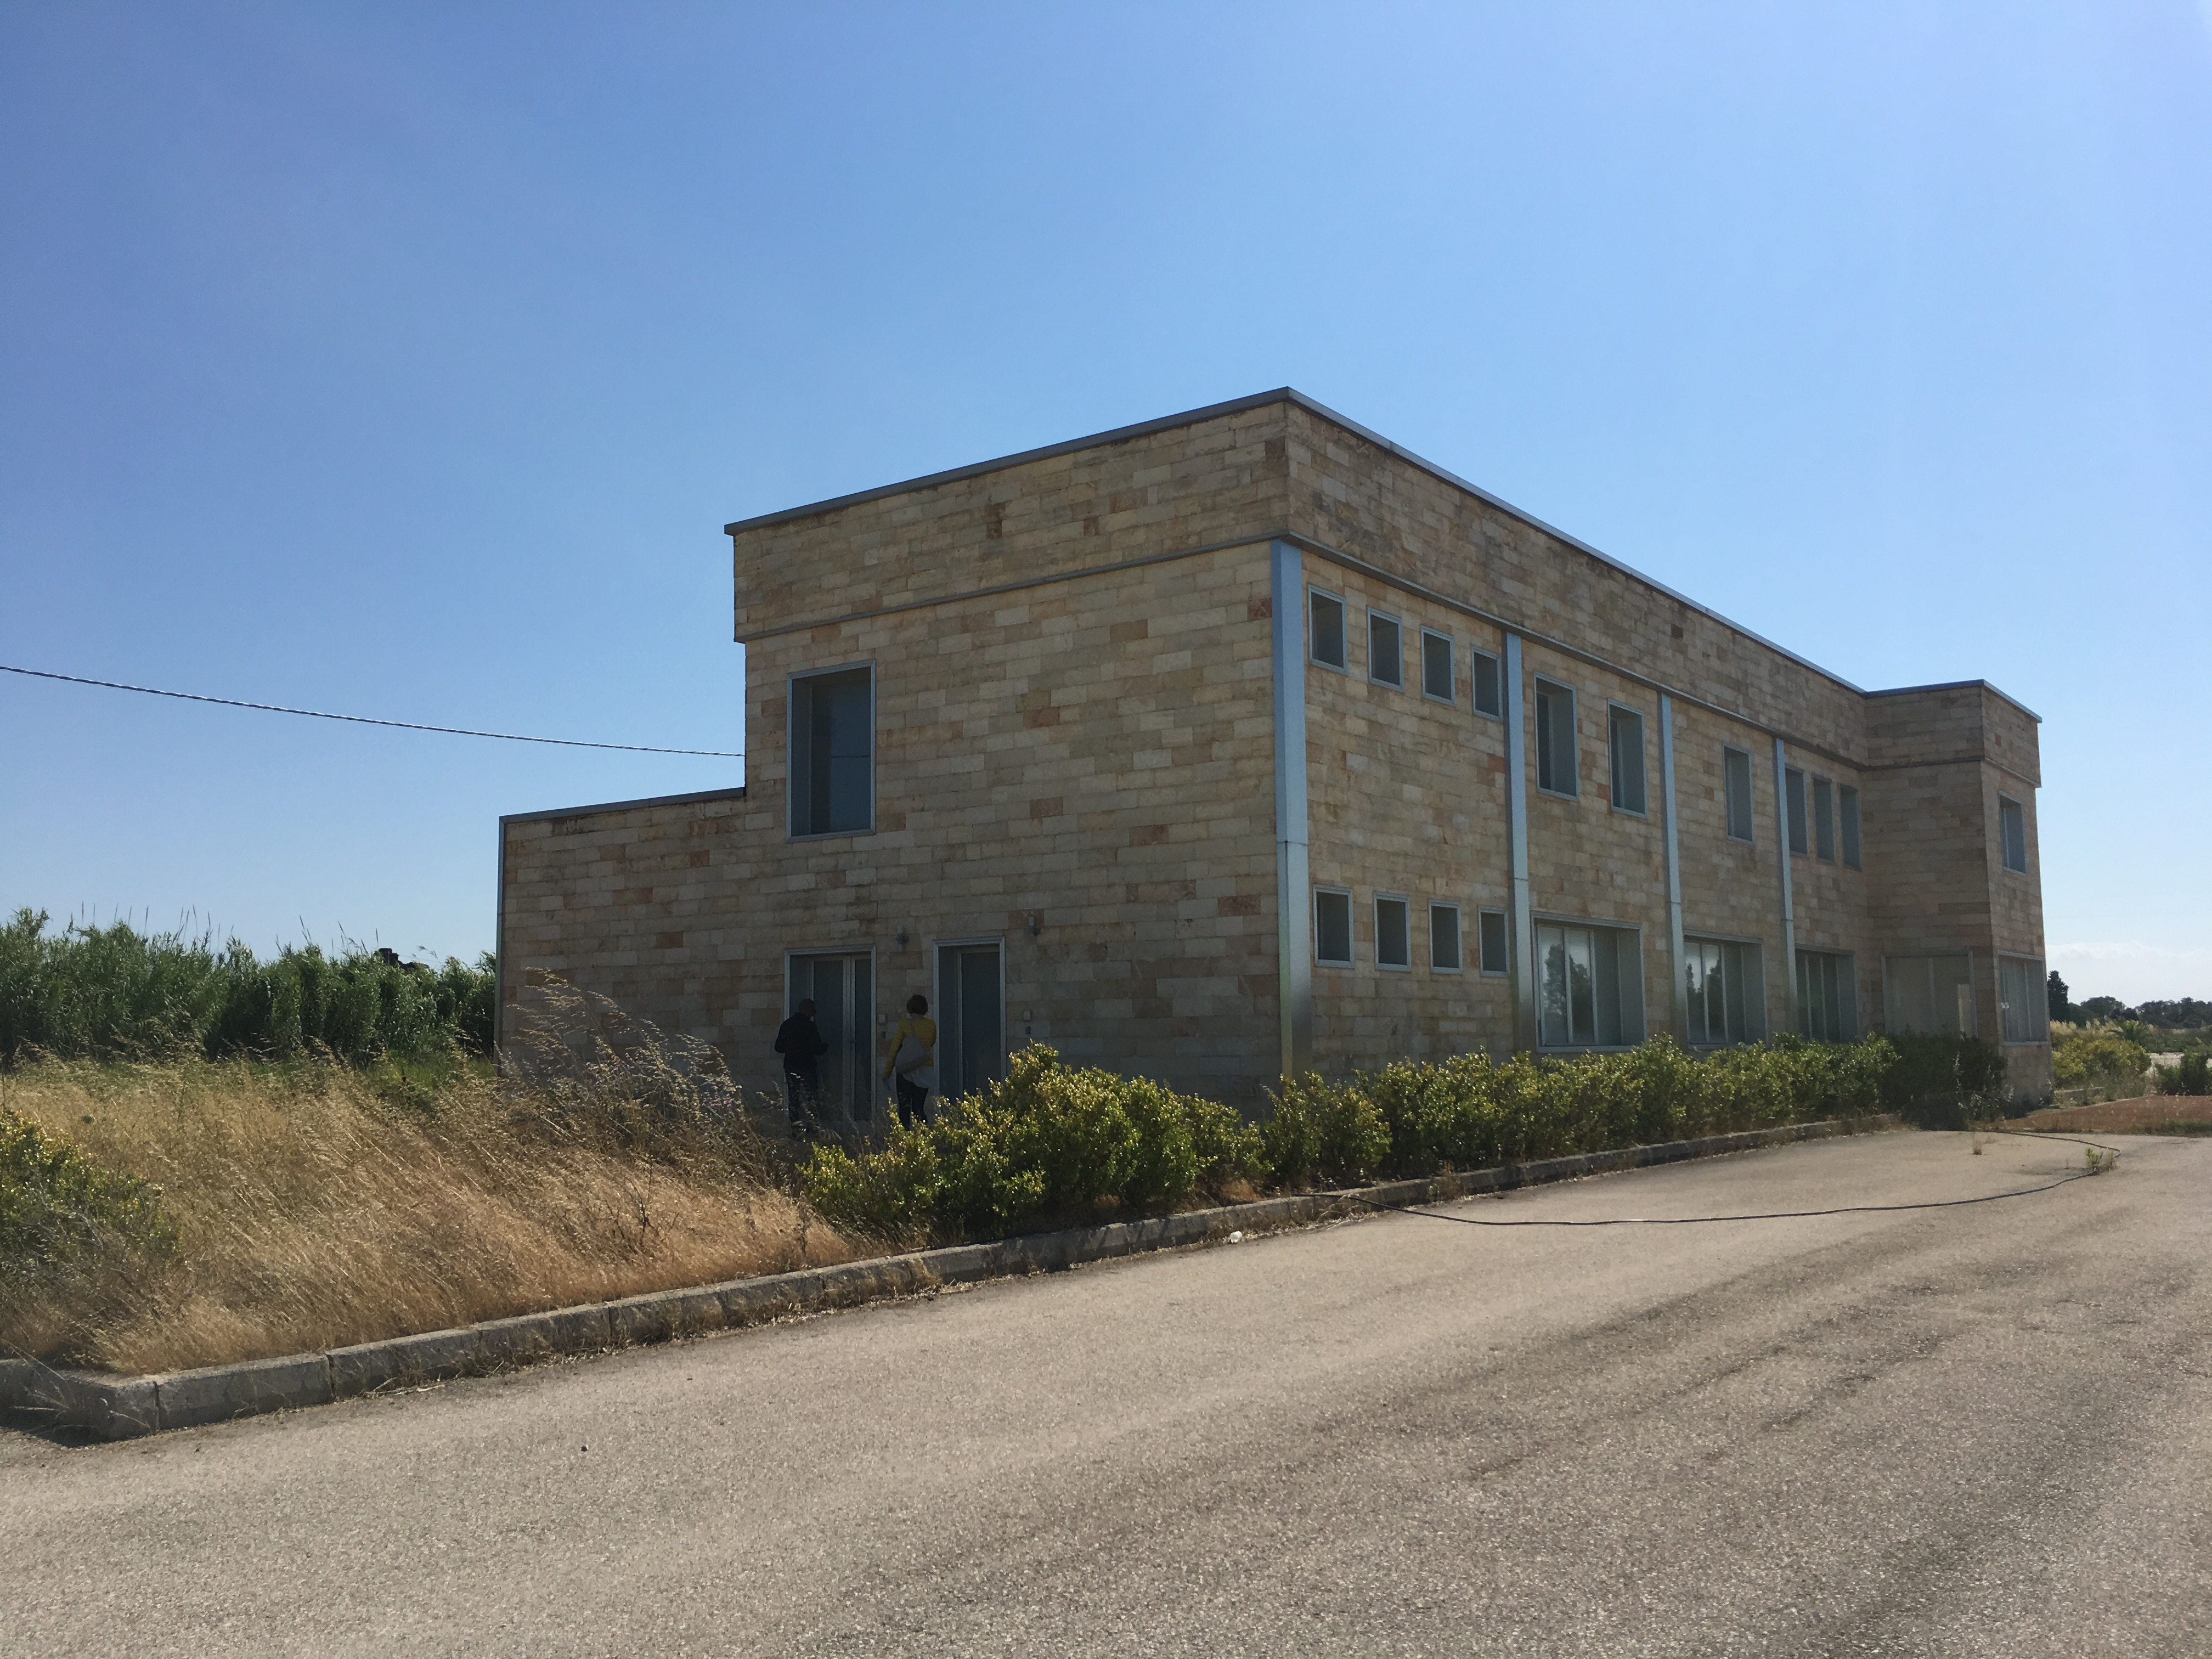 Palazzina uffici  S.Pietro  vernotico rif.366